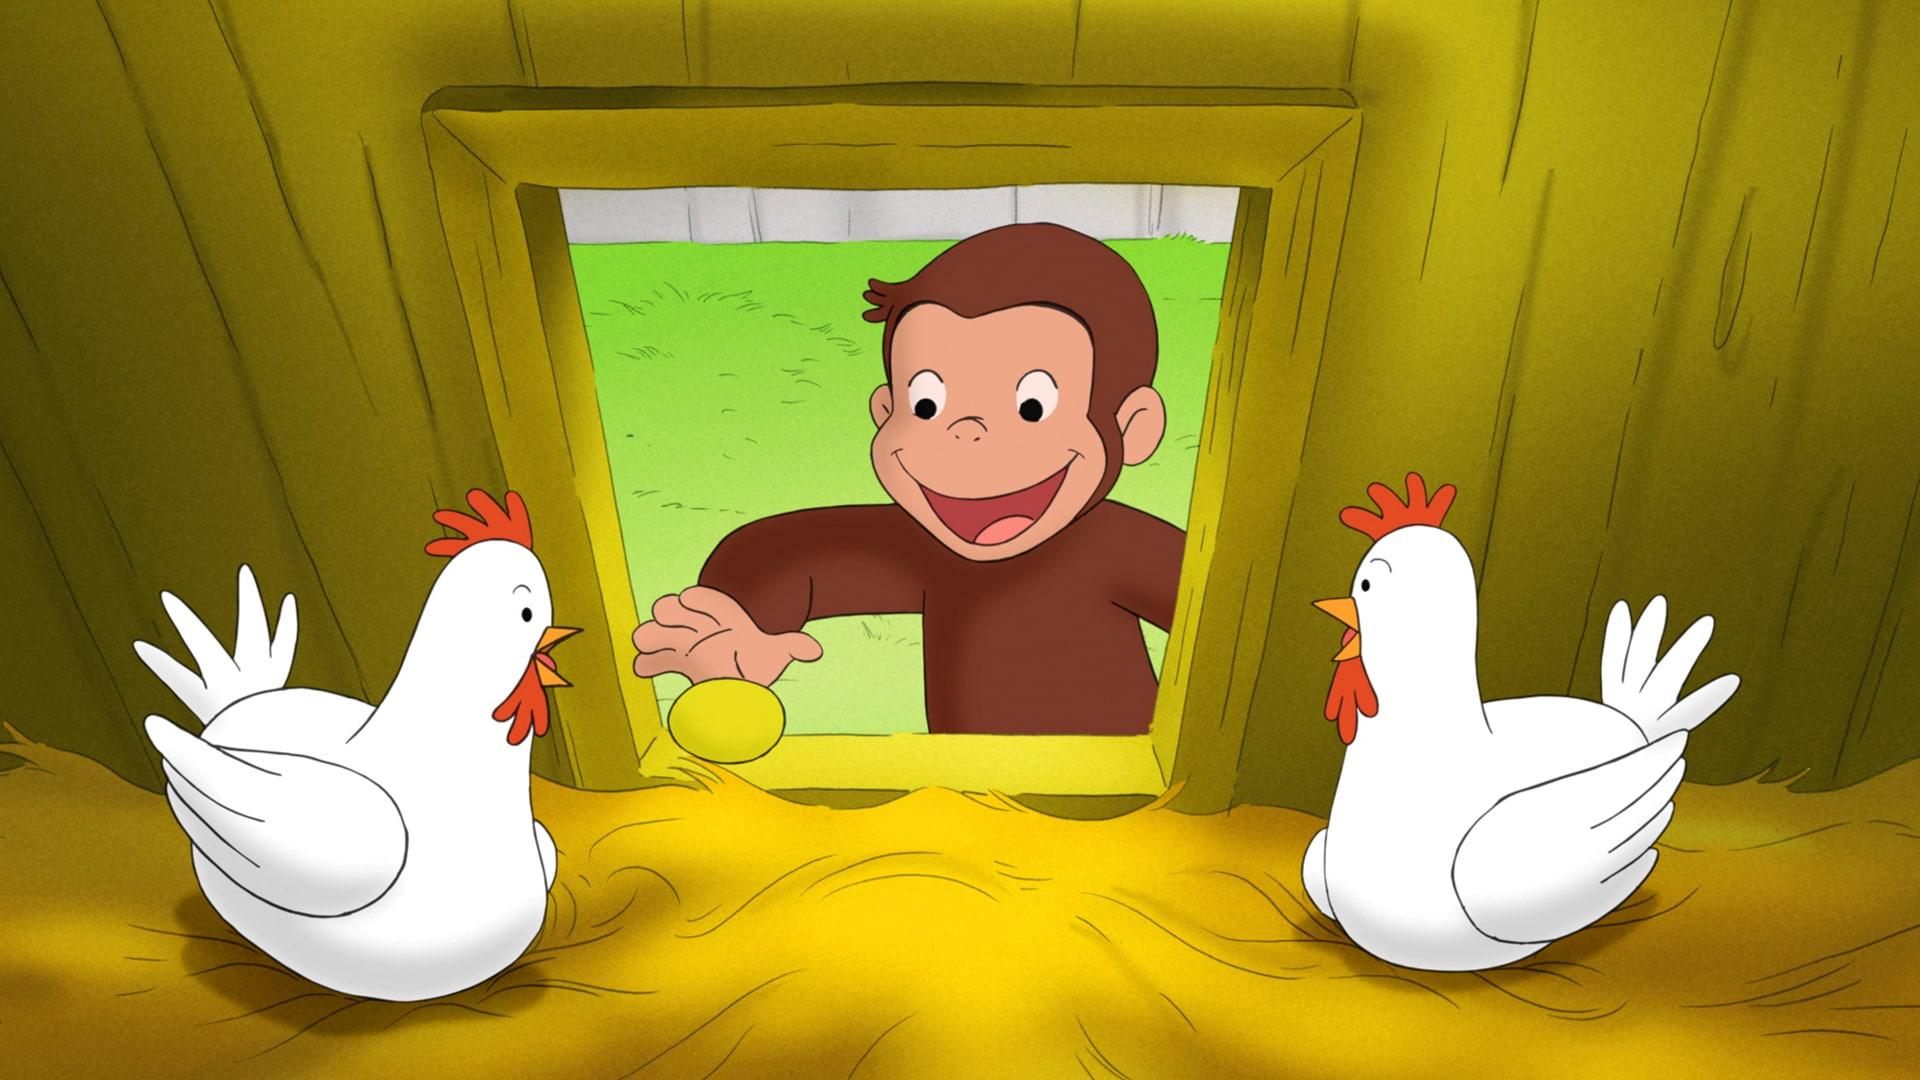 Flower Monkey; George and the Golden Egg Hunt